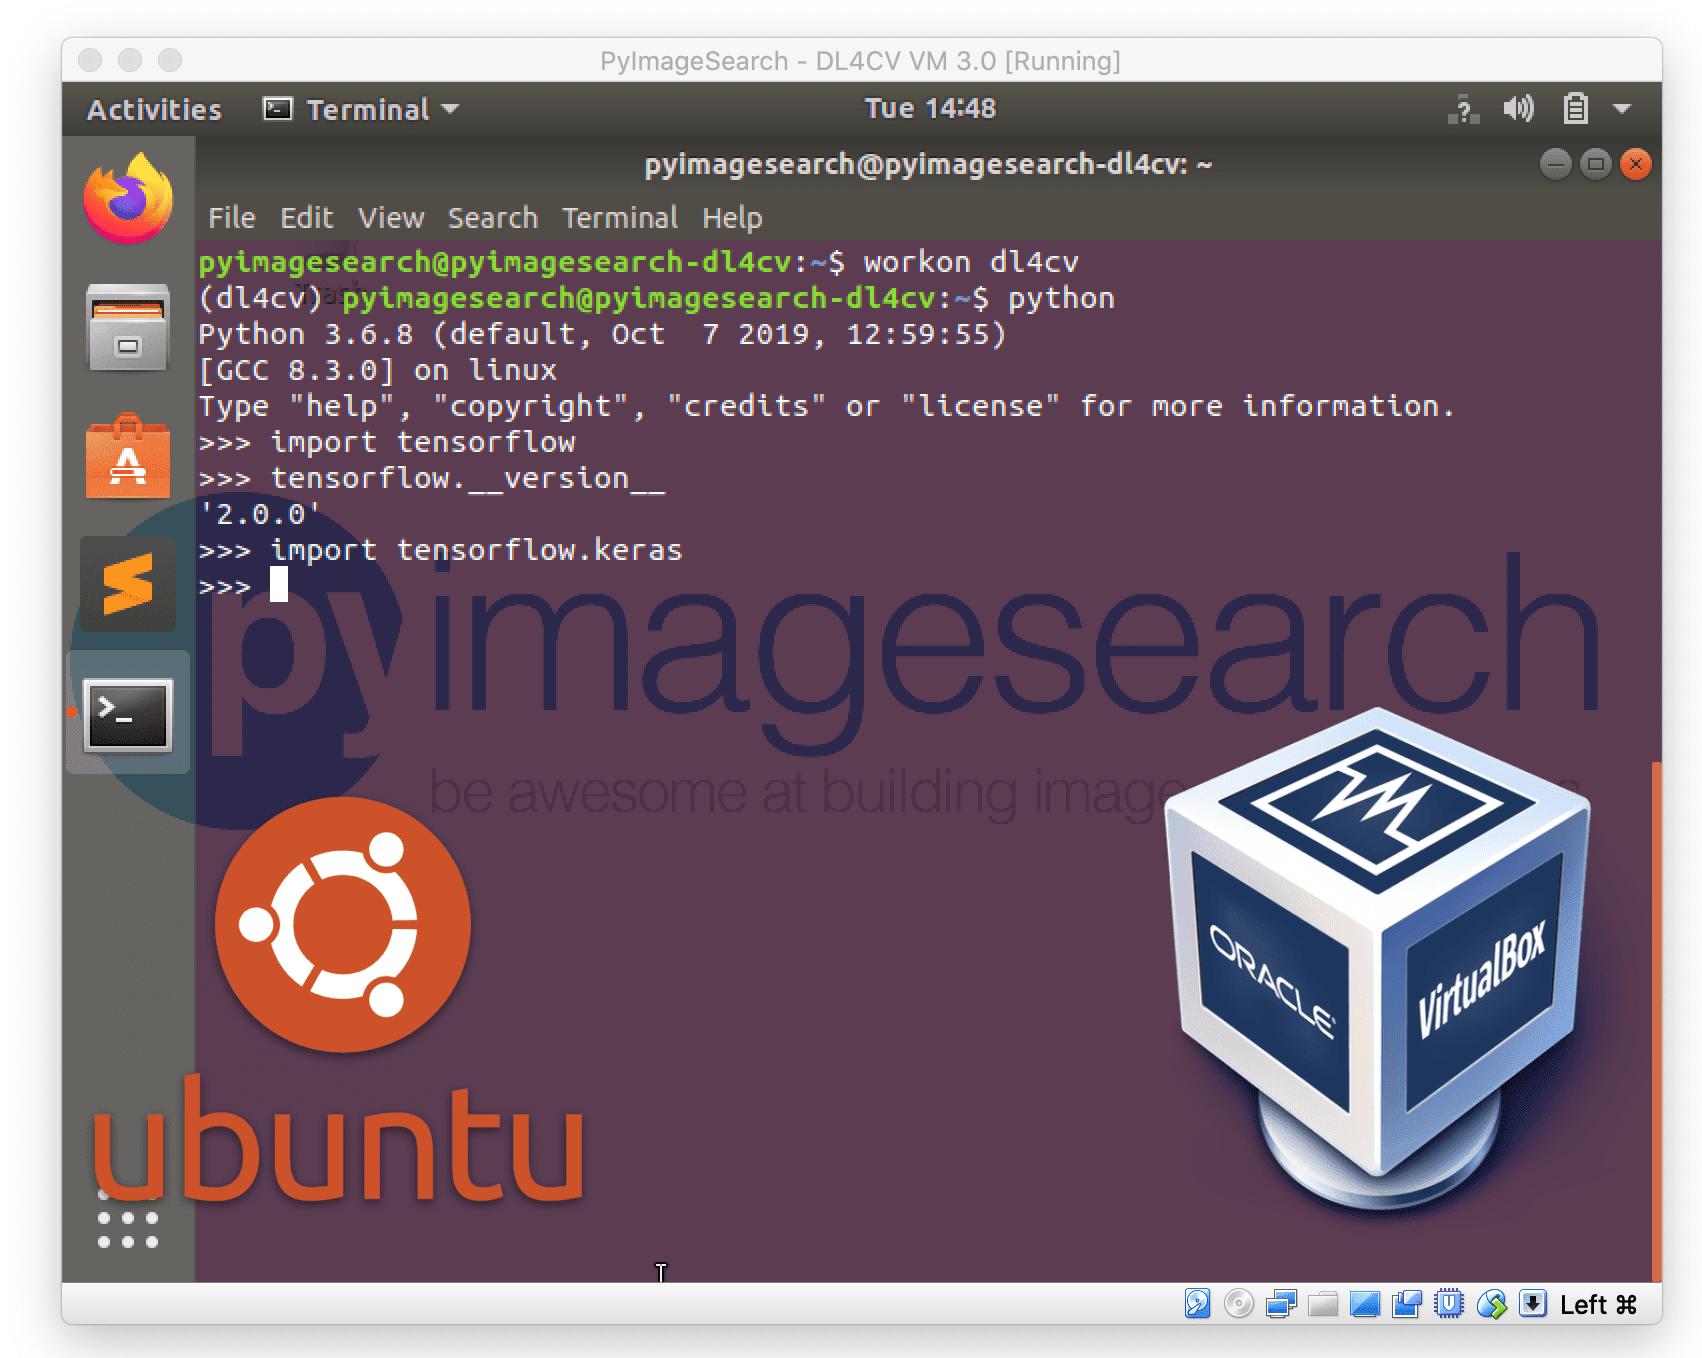 Your deep learning + Python Ubuntu virtual machine - PyImageSearch